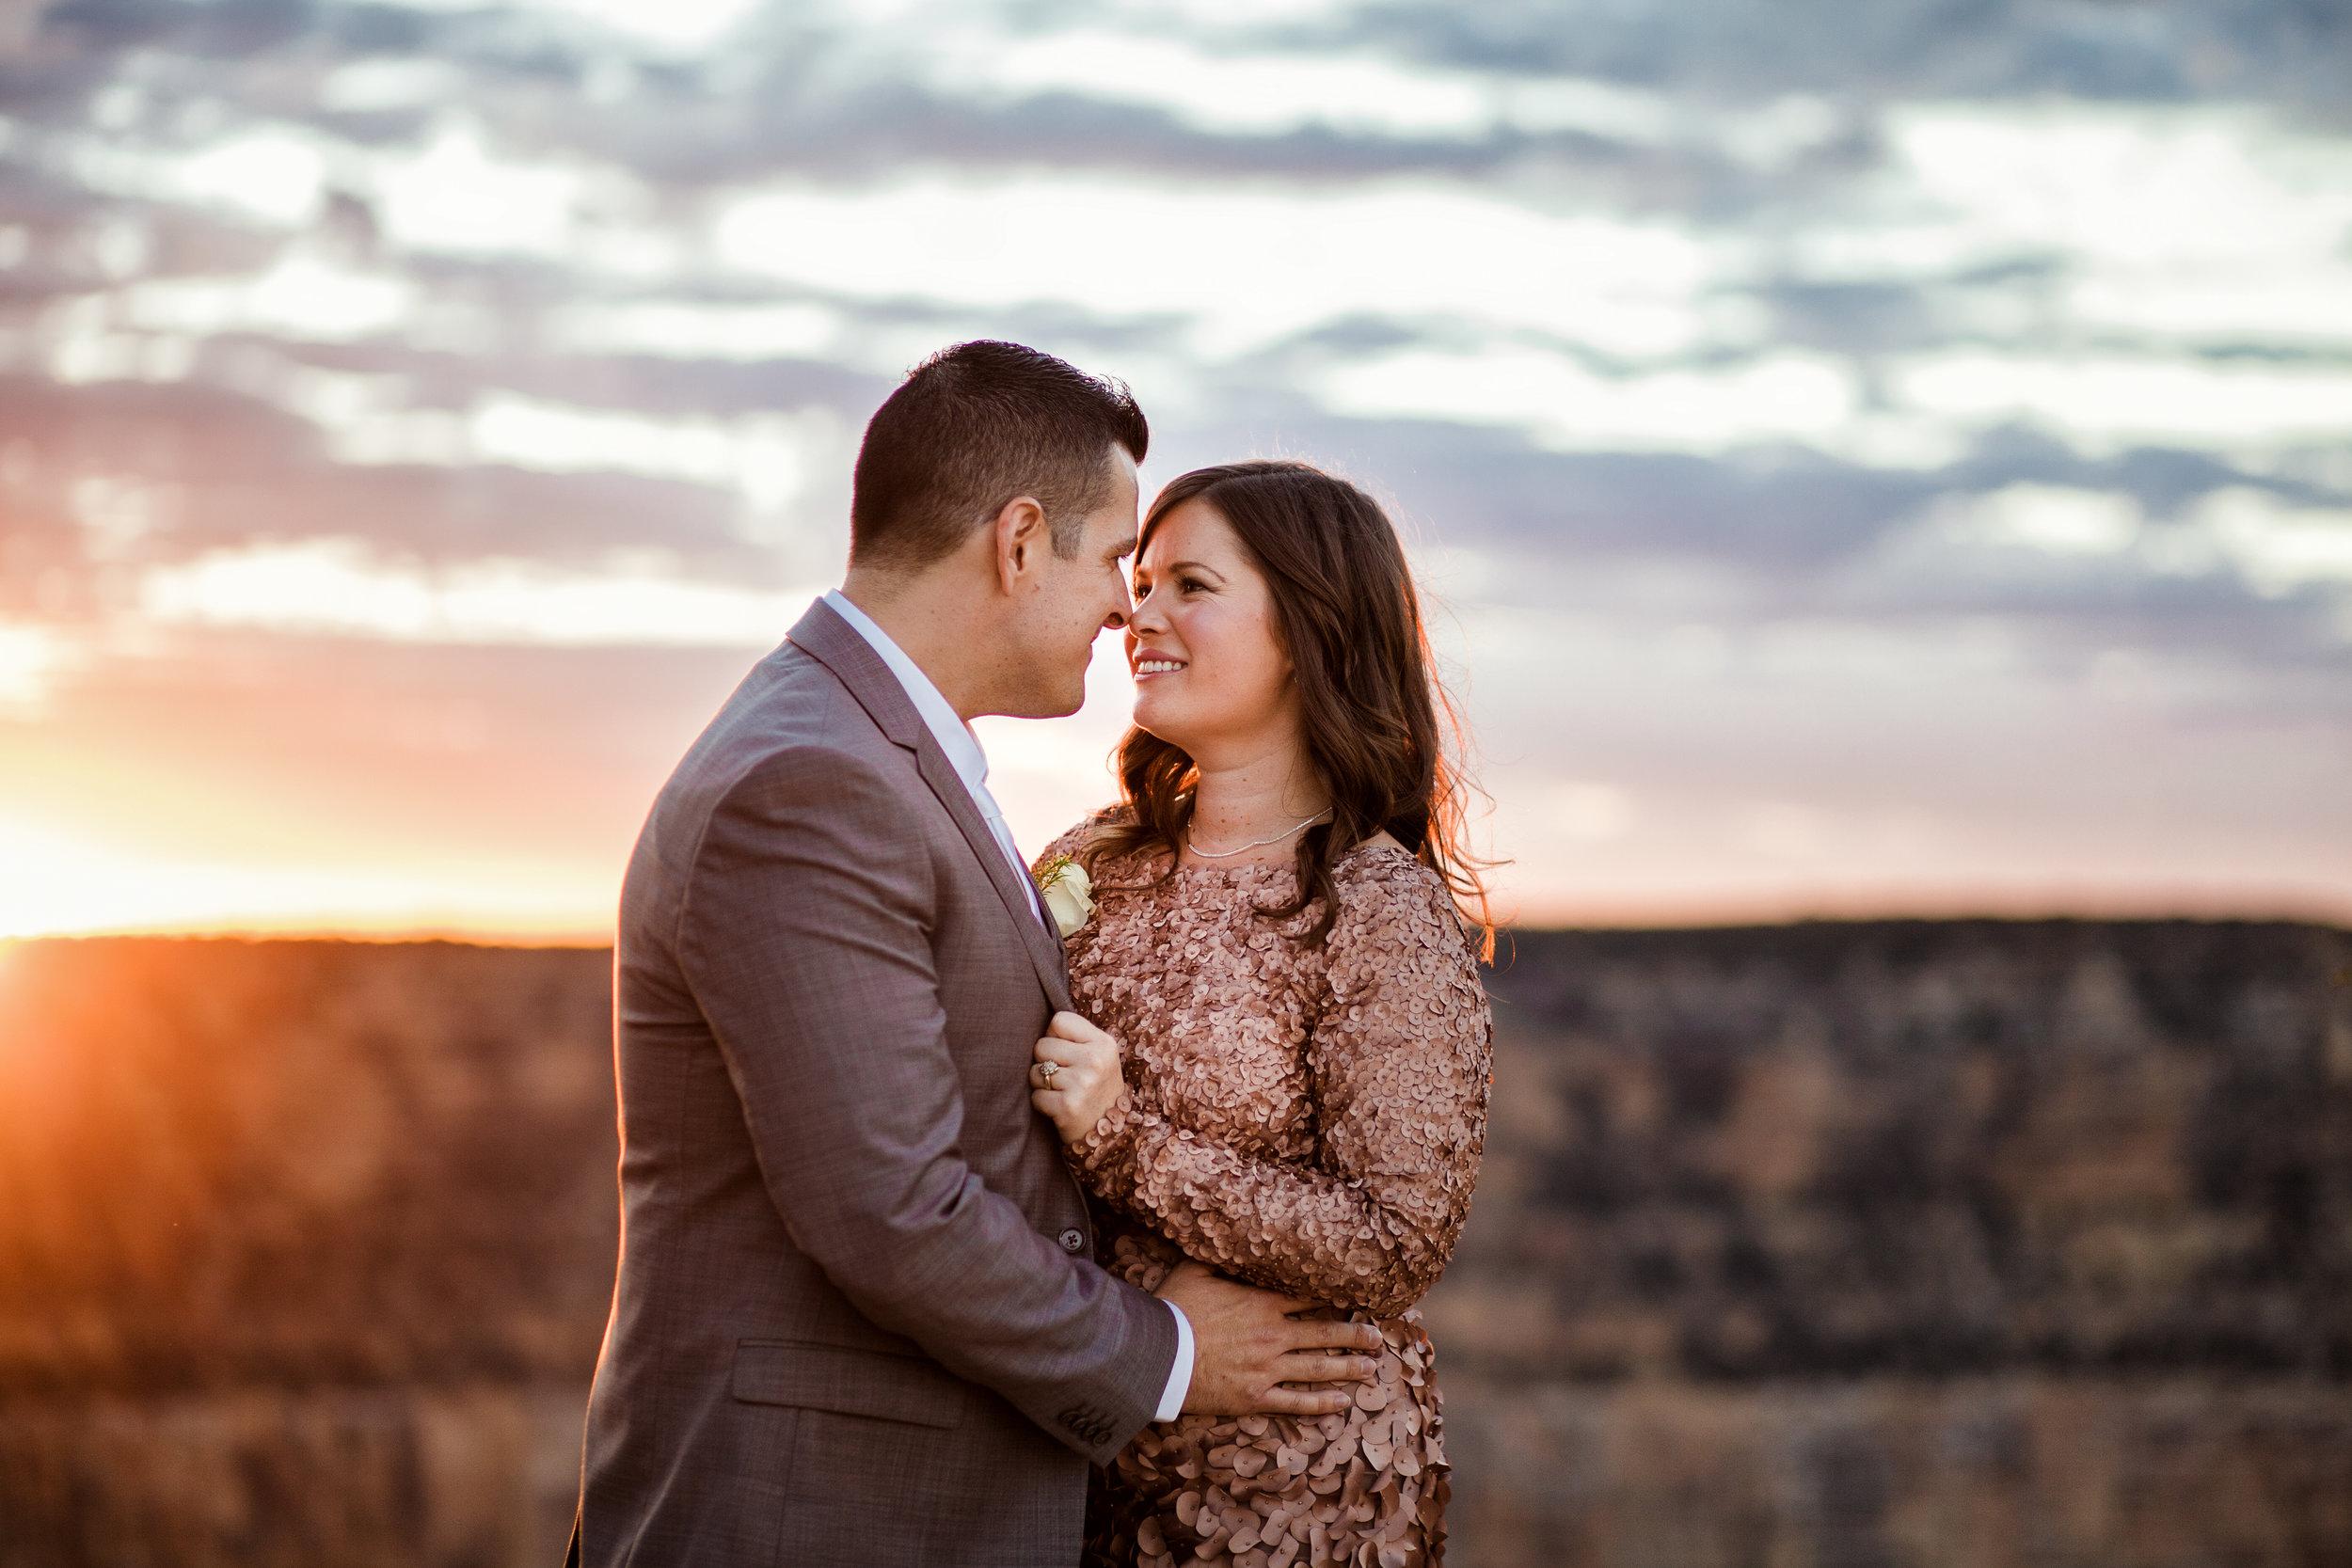 Arizona wedding photographer, Granduer Point, Grand canyon